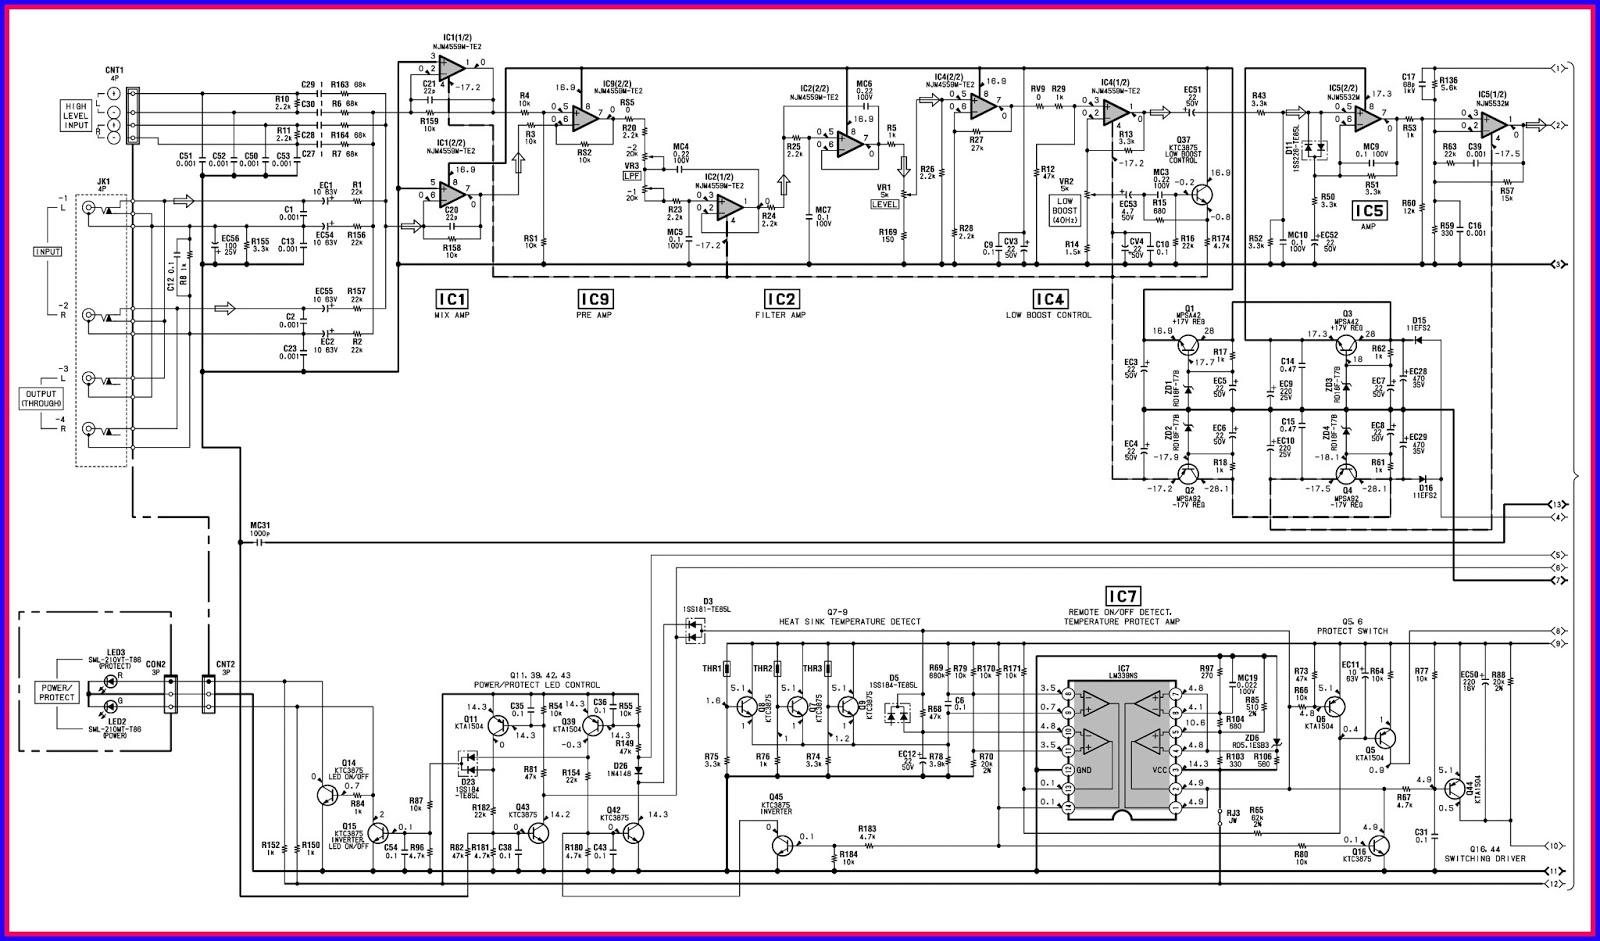 ELECTRONIC EQUIPMENT REPAIR CENTRE : SONY XPLOD XMD1000P5 CAR AMP CIRCUIT DIAGRAM